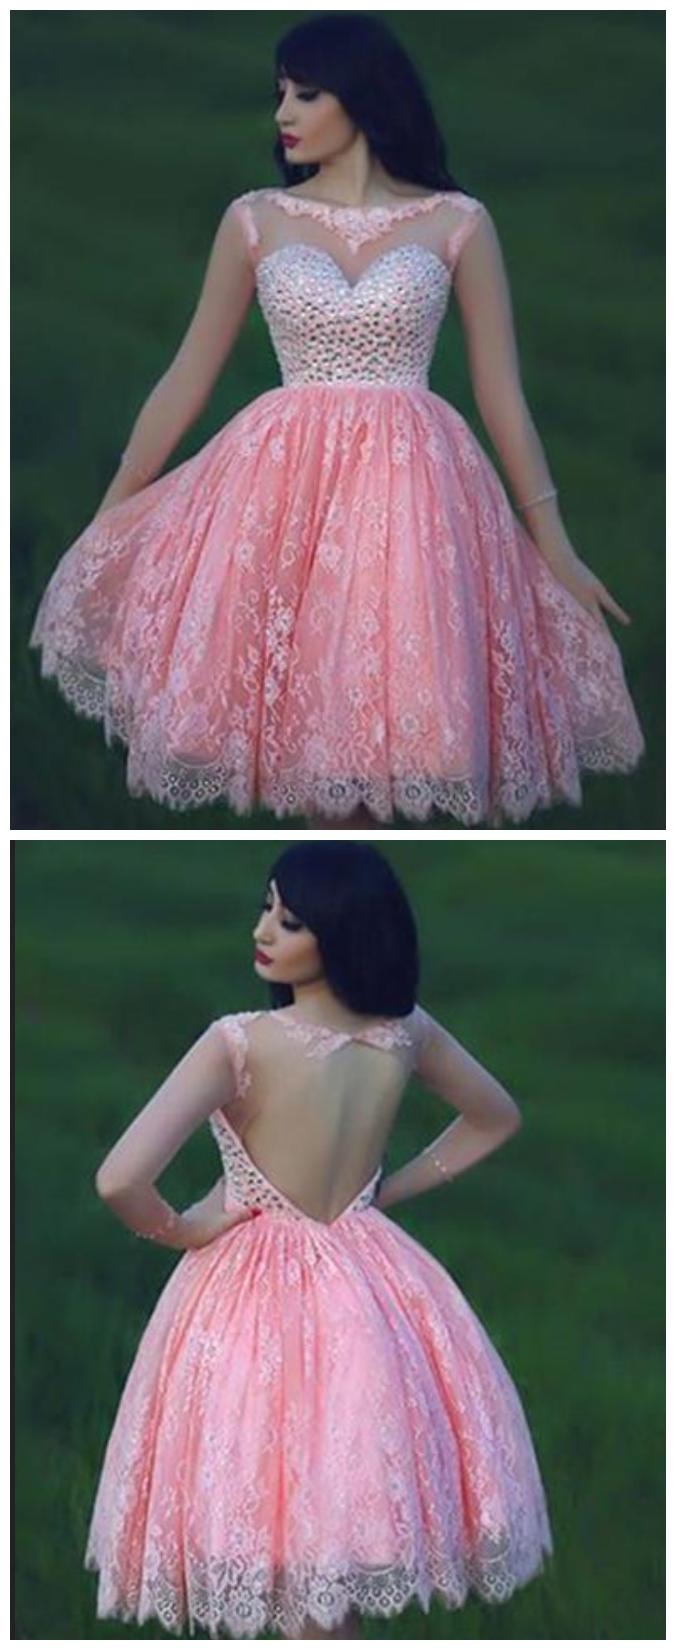 Lace Homecoming Dress,Pink Homecoming Dress,Pink Homecoming Dress ...